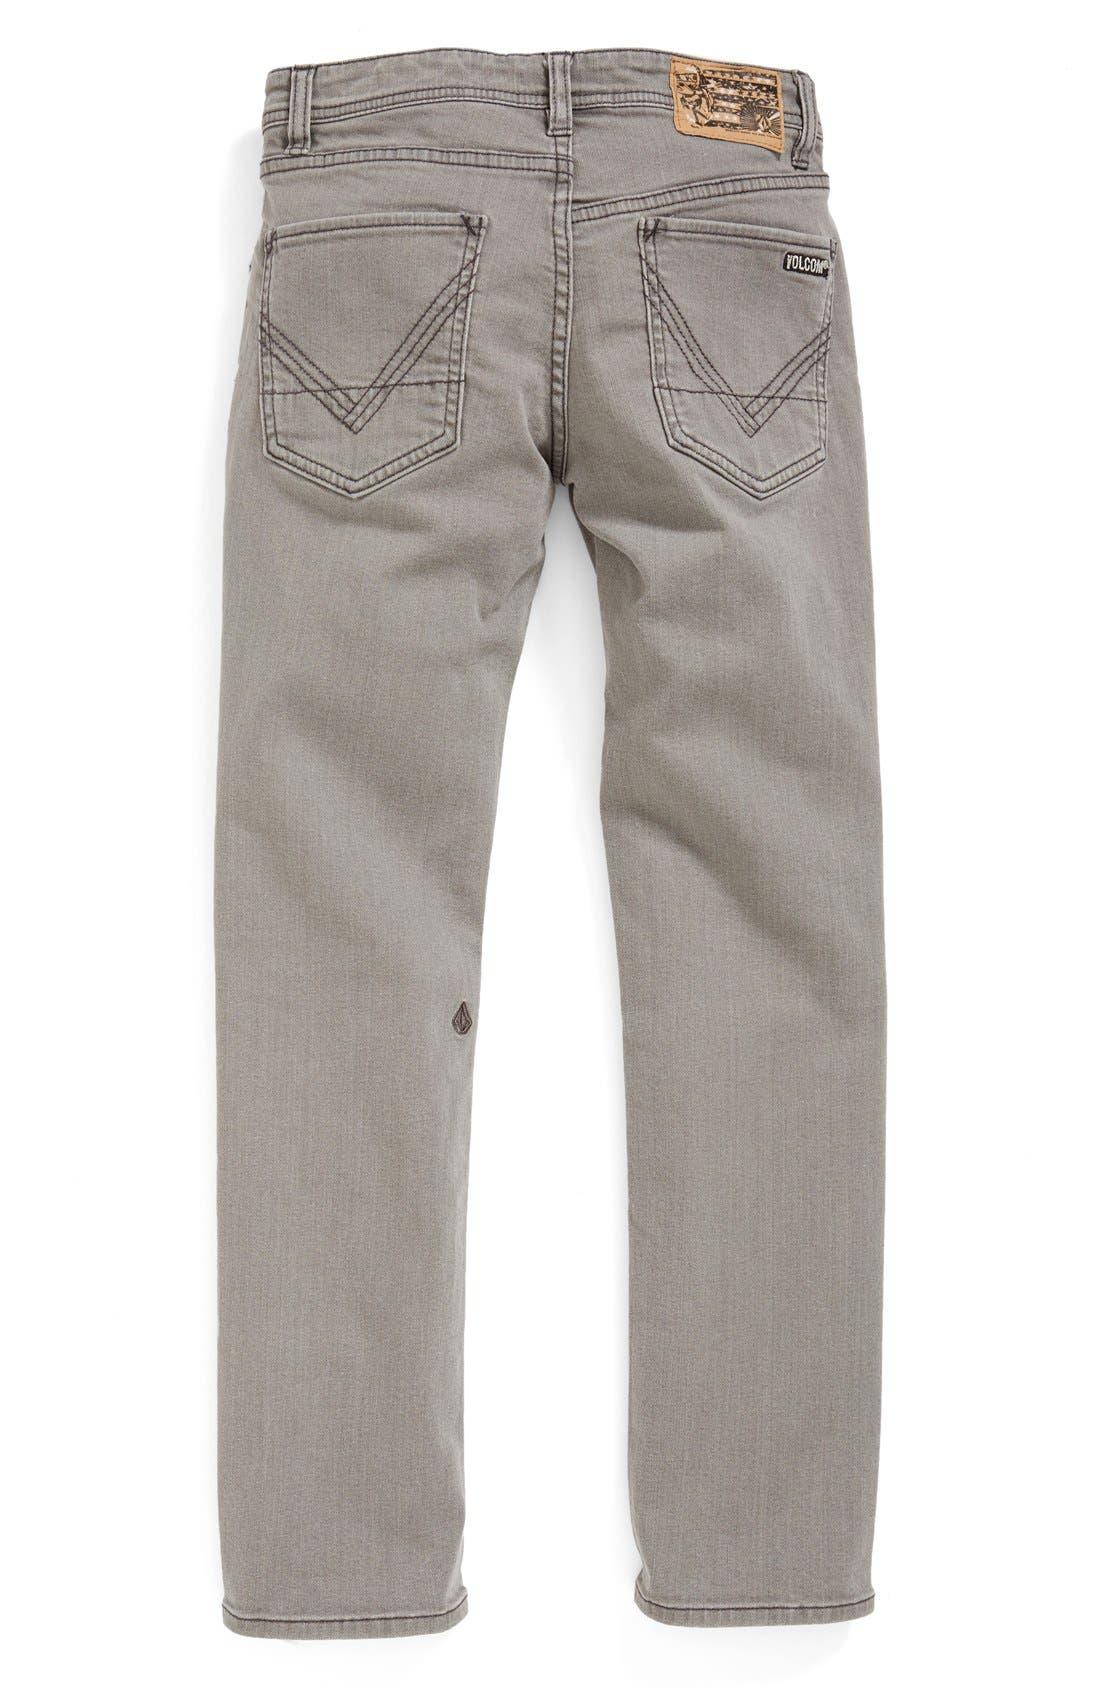 Alternate Image 1 Selected - Volcom 'Vorta' Slim Fit Jeans (Big Boys)